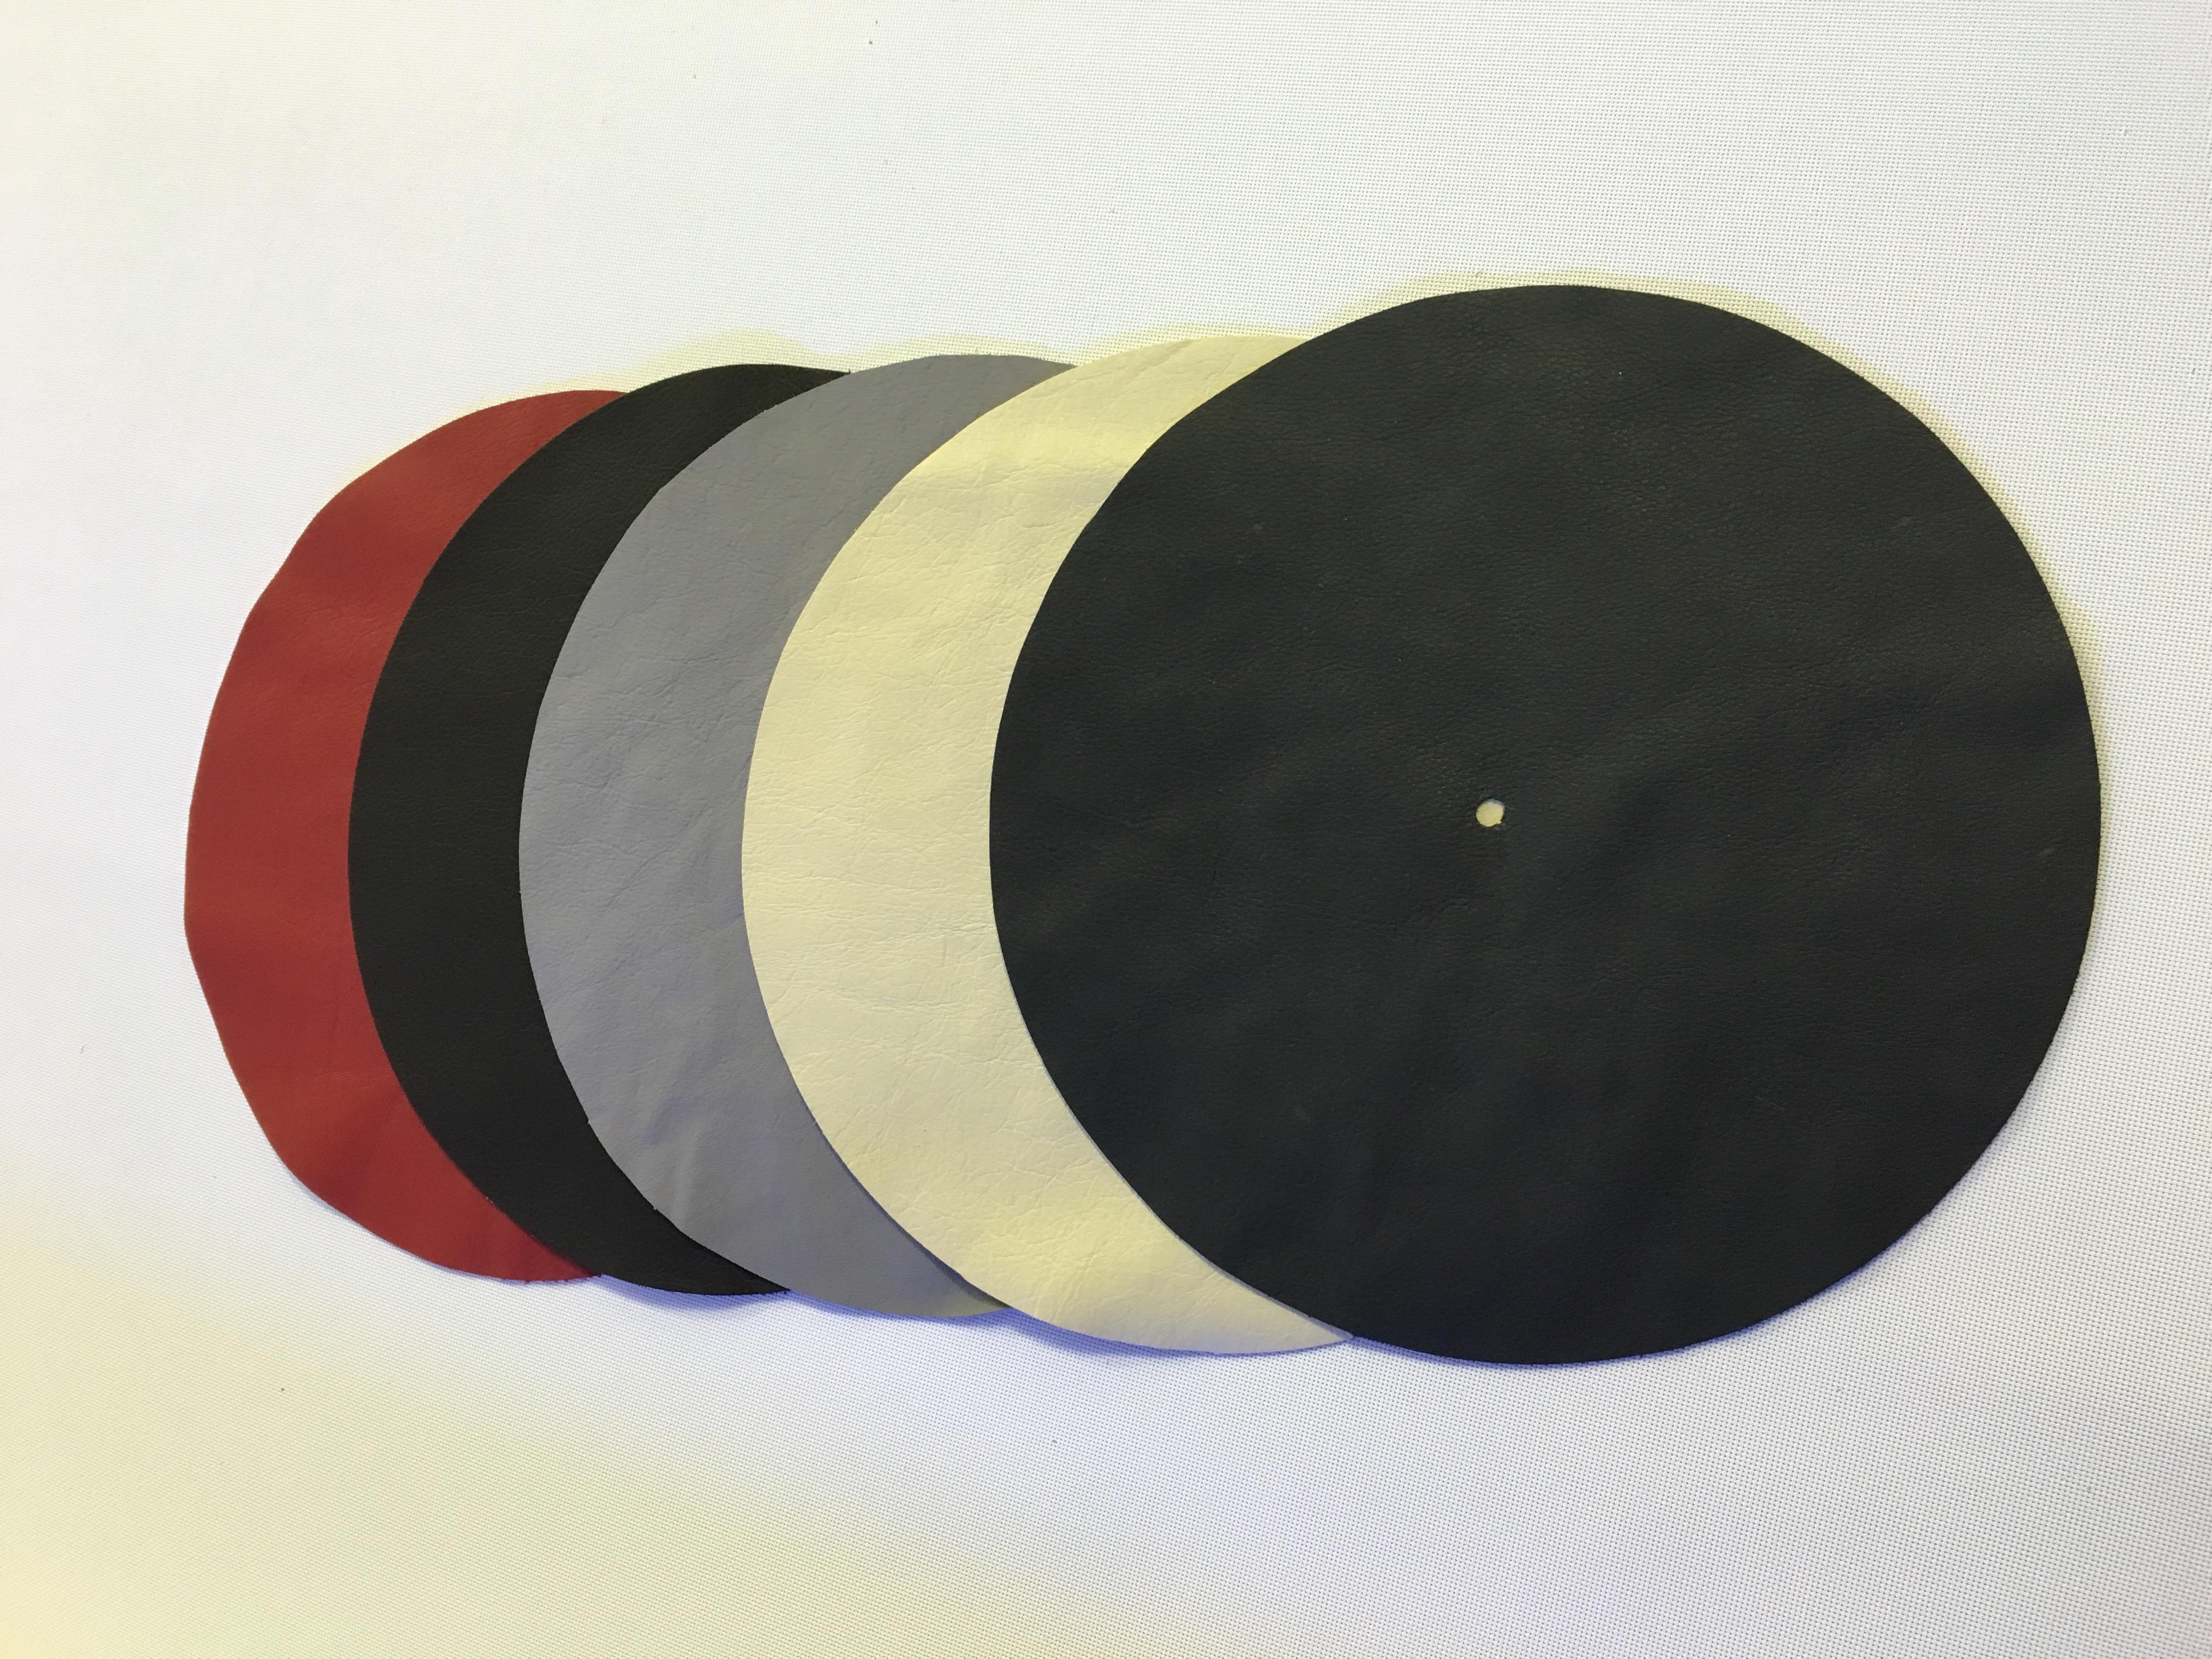 Plattentellerauflage Echtleder